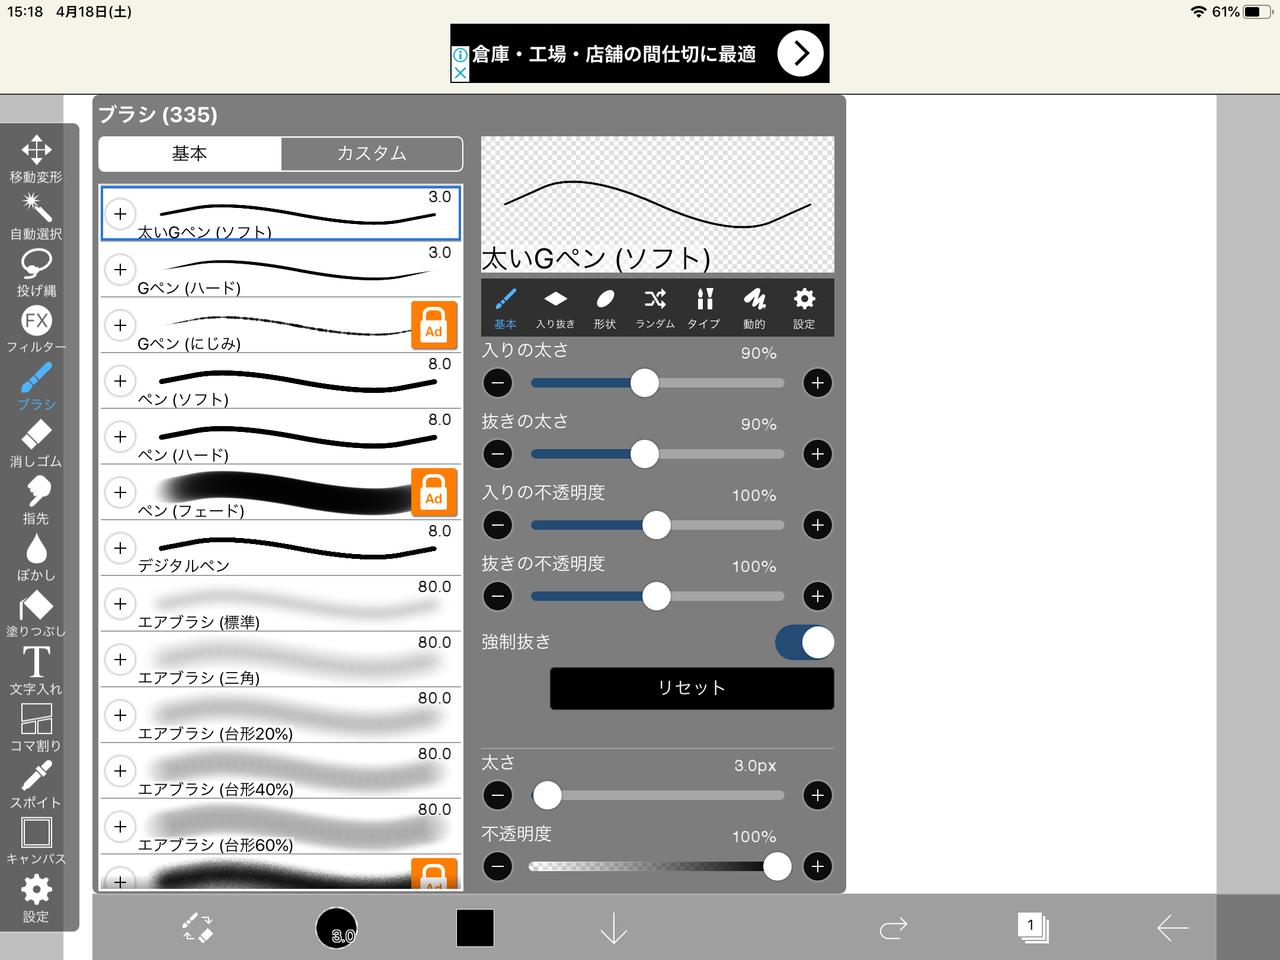 f:id:Imamura:20200419174742p:plain